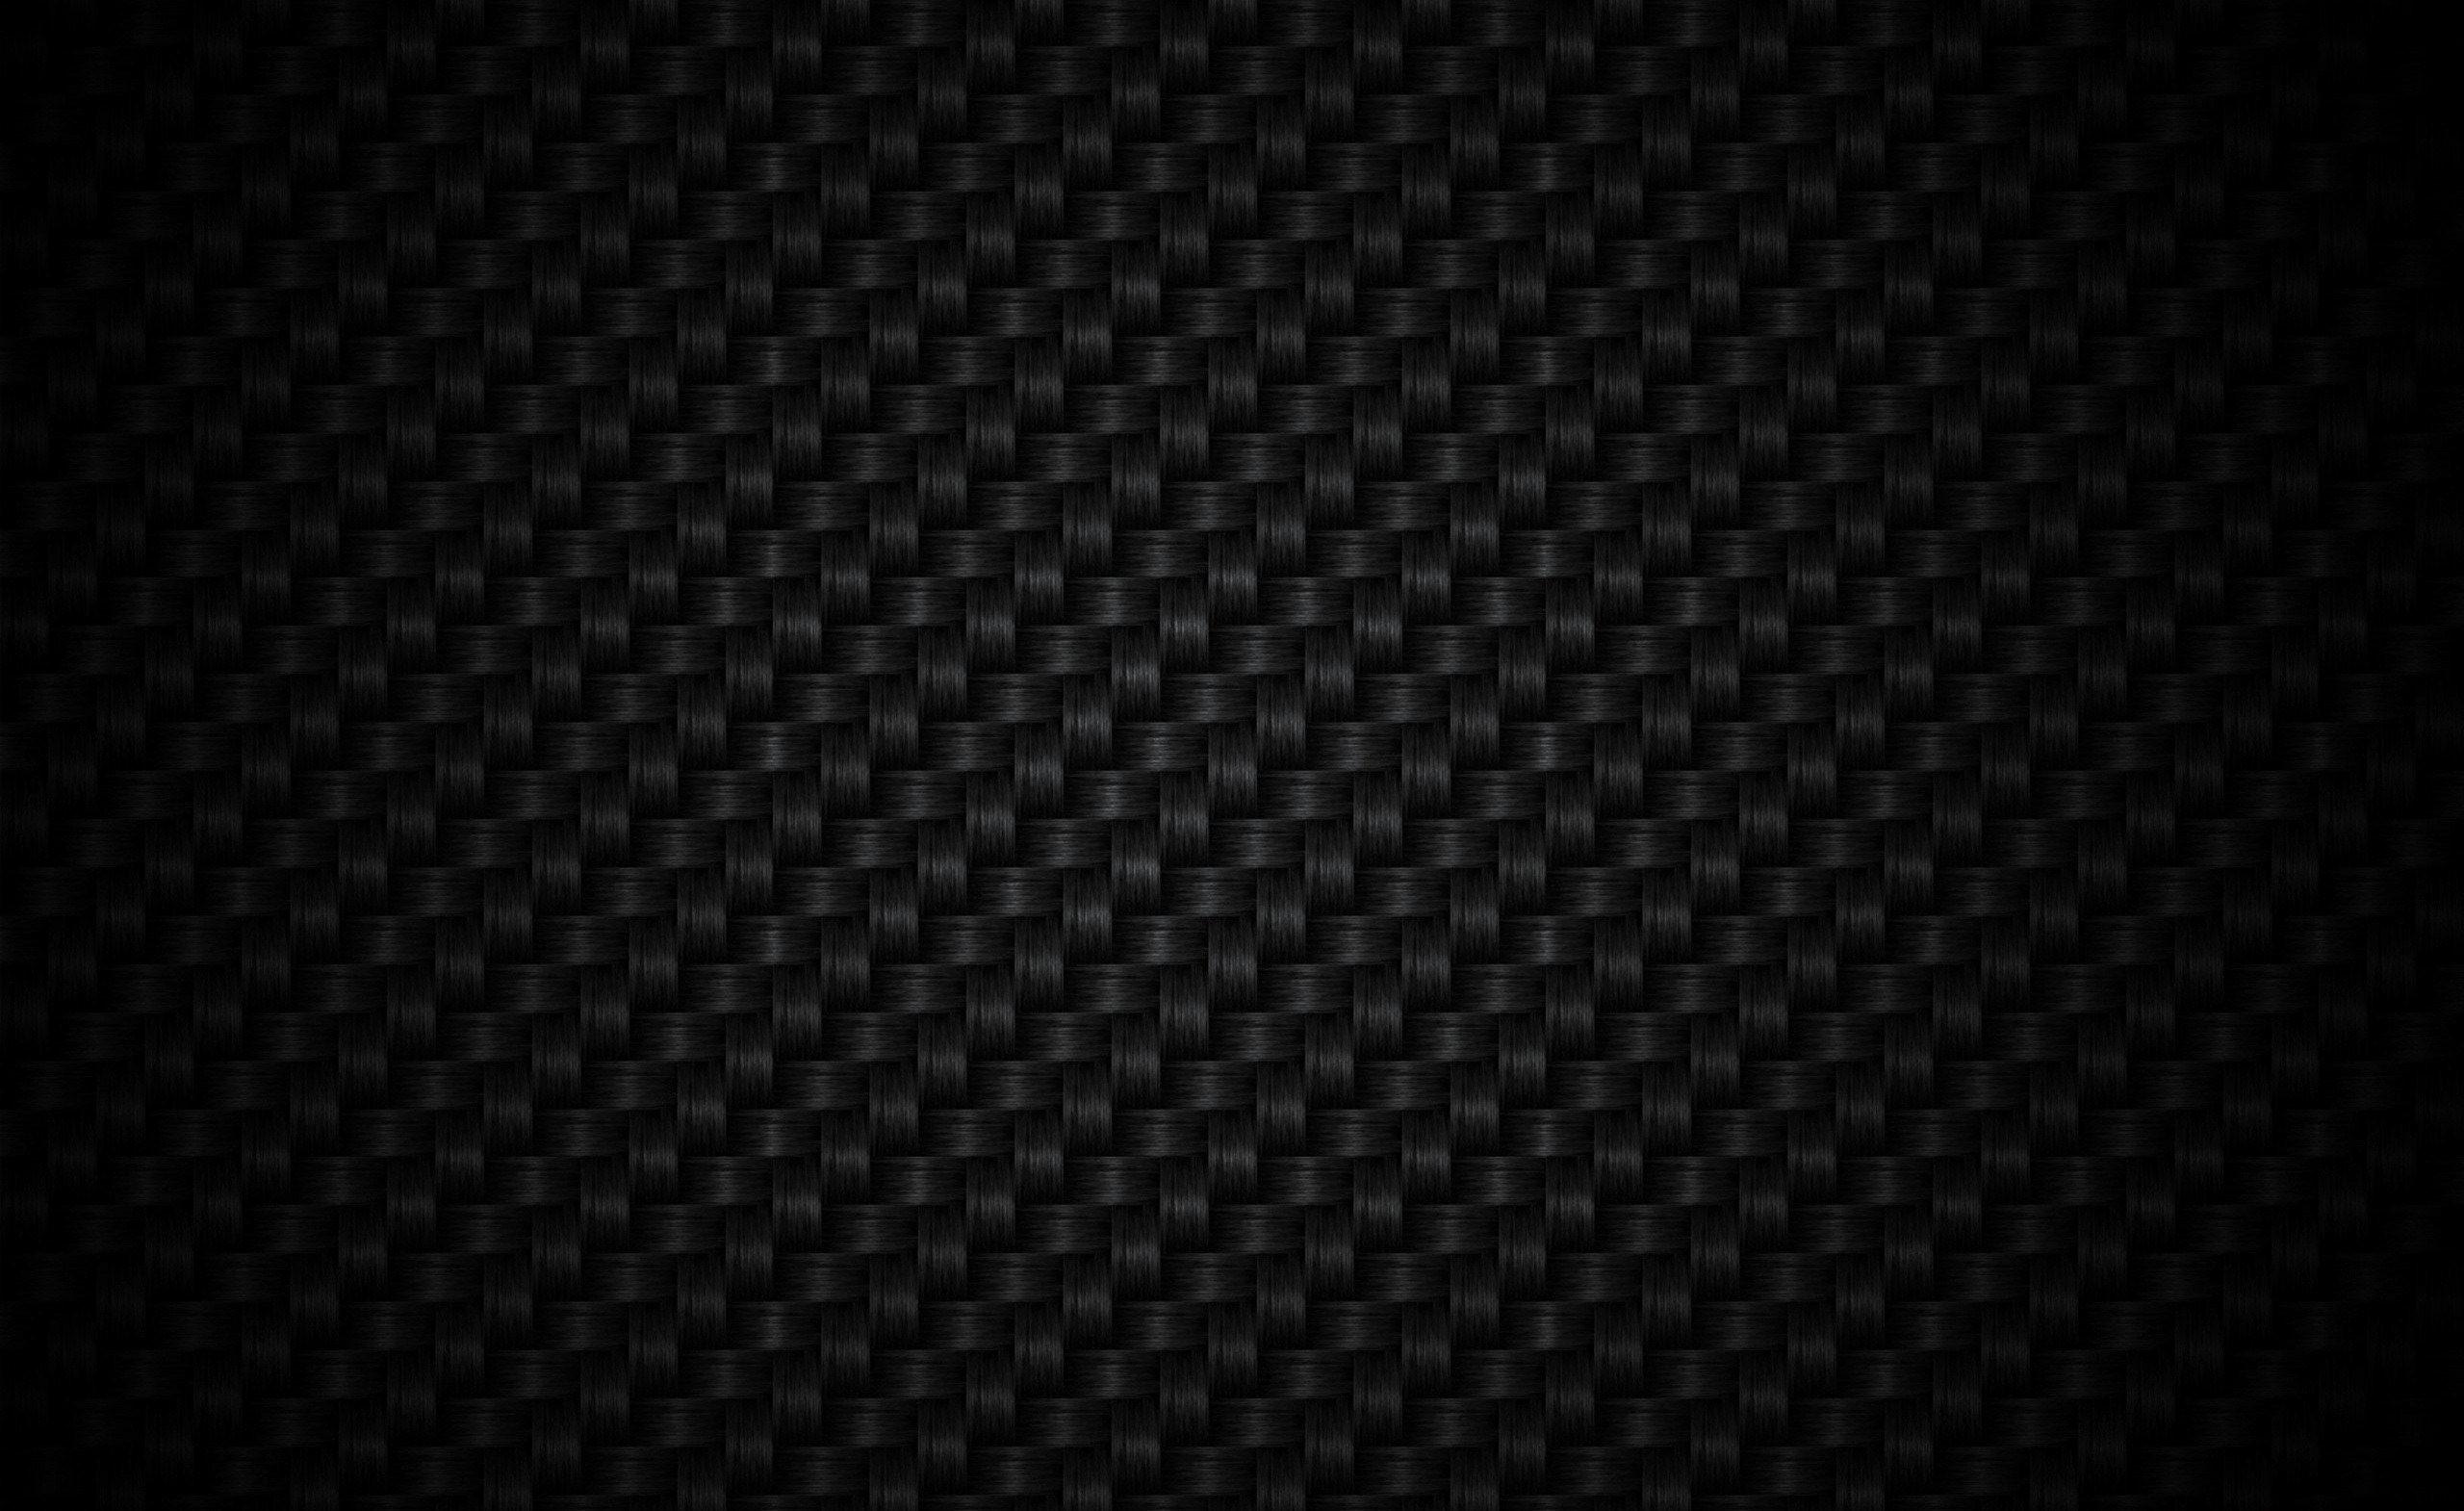 Black Texture | HD Wallpapers Photos